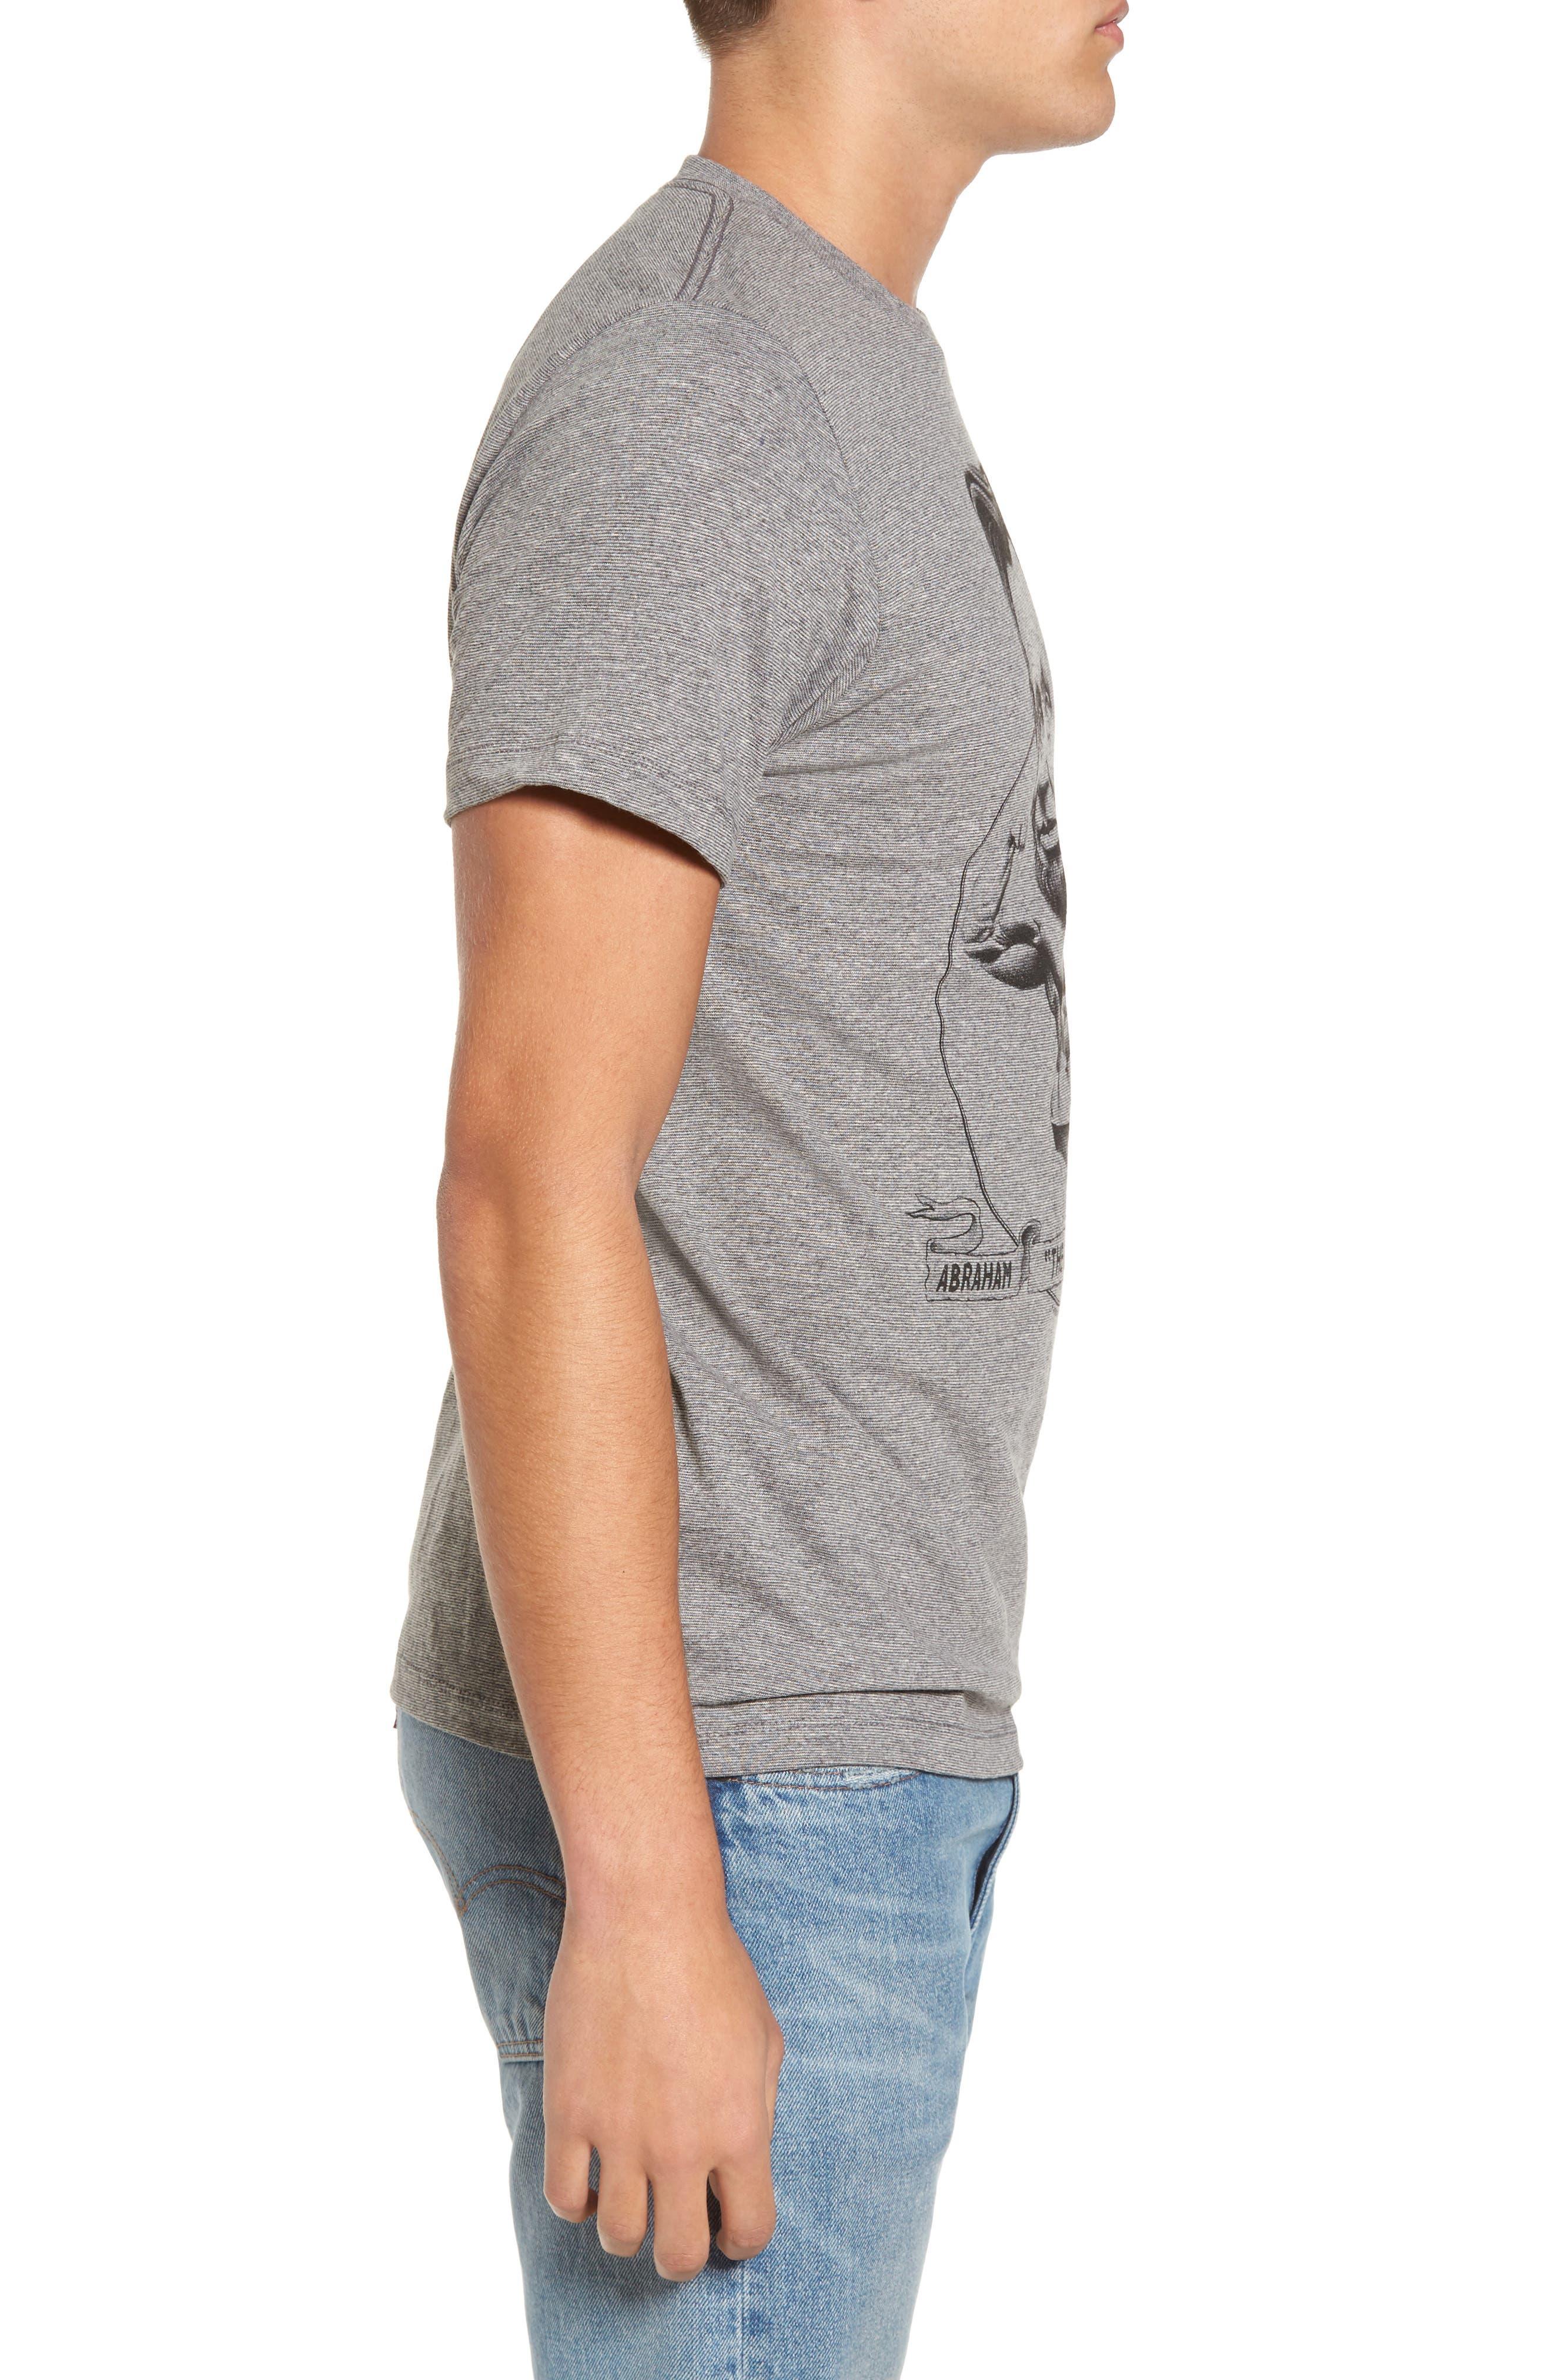 Abe Lincoln T-Shirt,                             Alternate thumbnail 3, color,